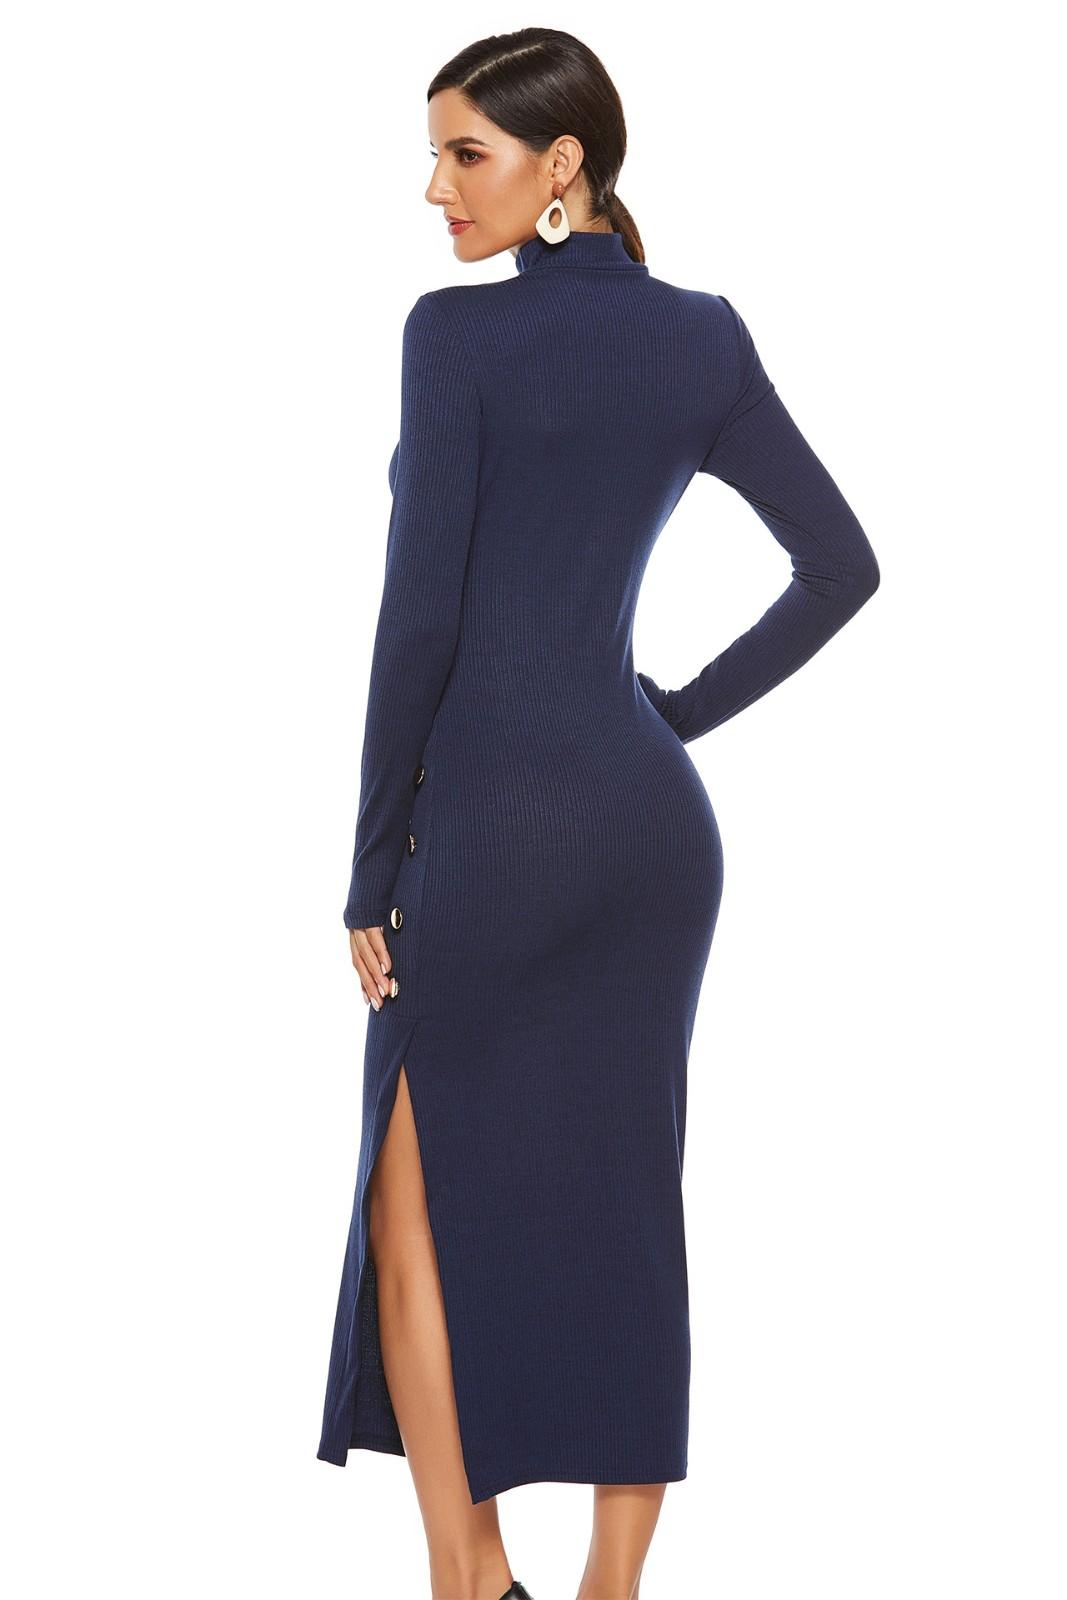 Plus Size Women Fashion Canonicals Maxi Long Sleeve Sexy Tank Slim Fit Dress